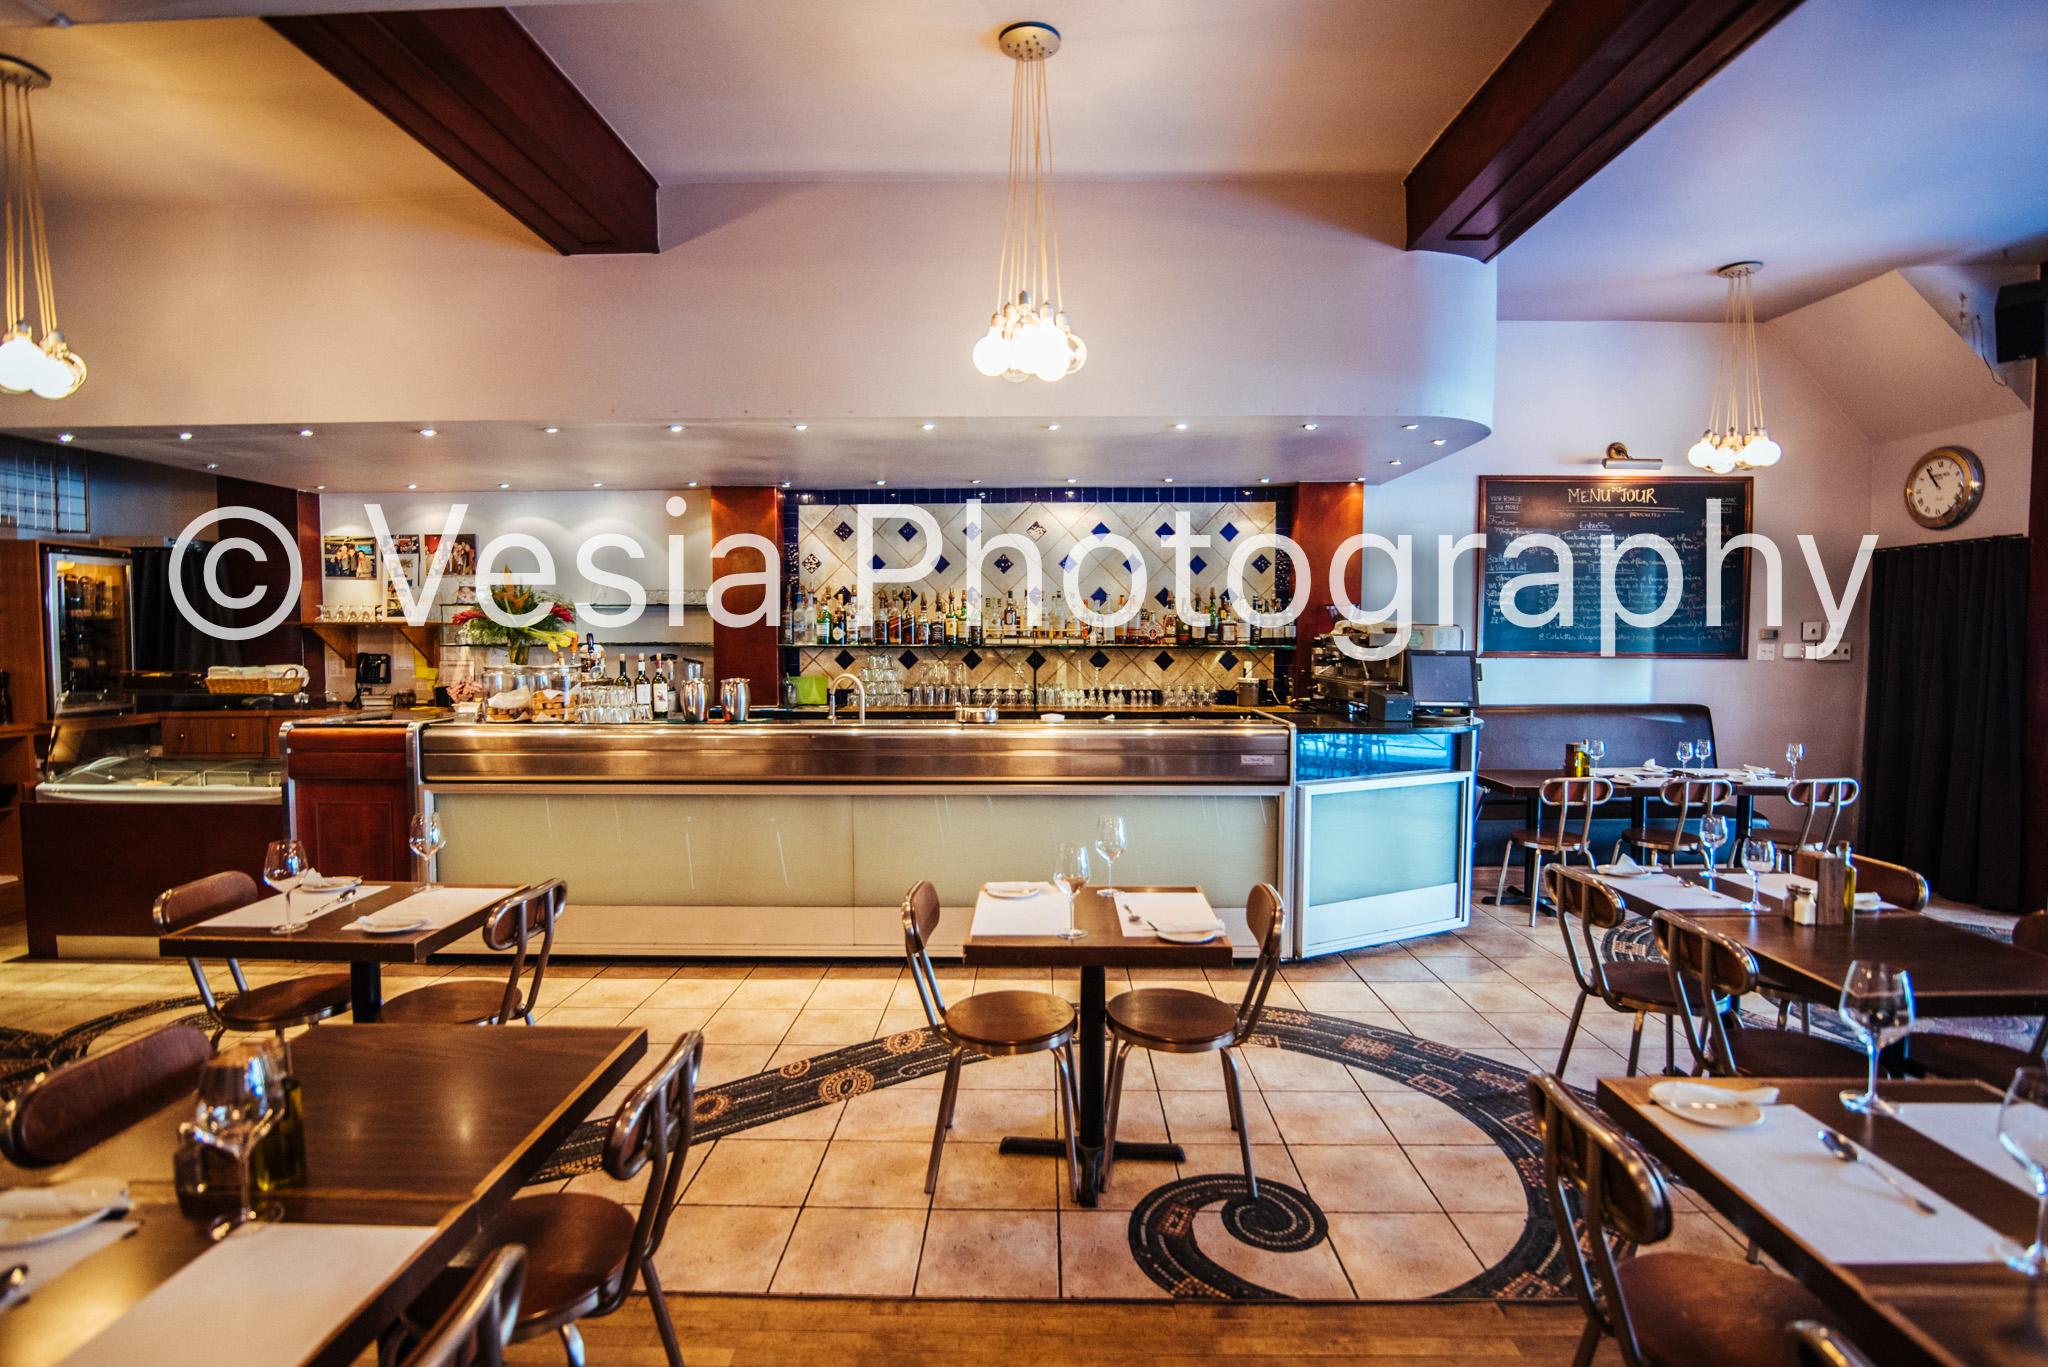 Cafe_Epoca_Proofs-7.jpg